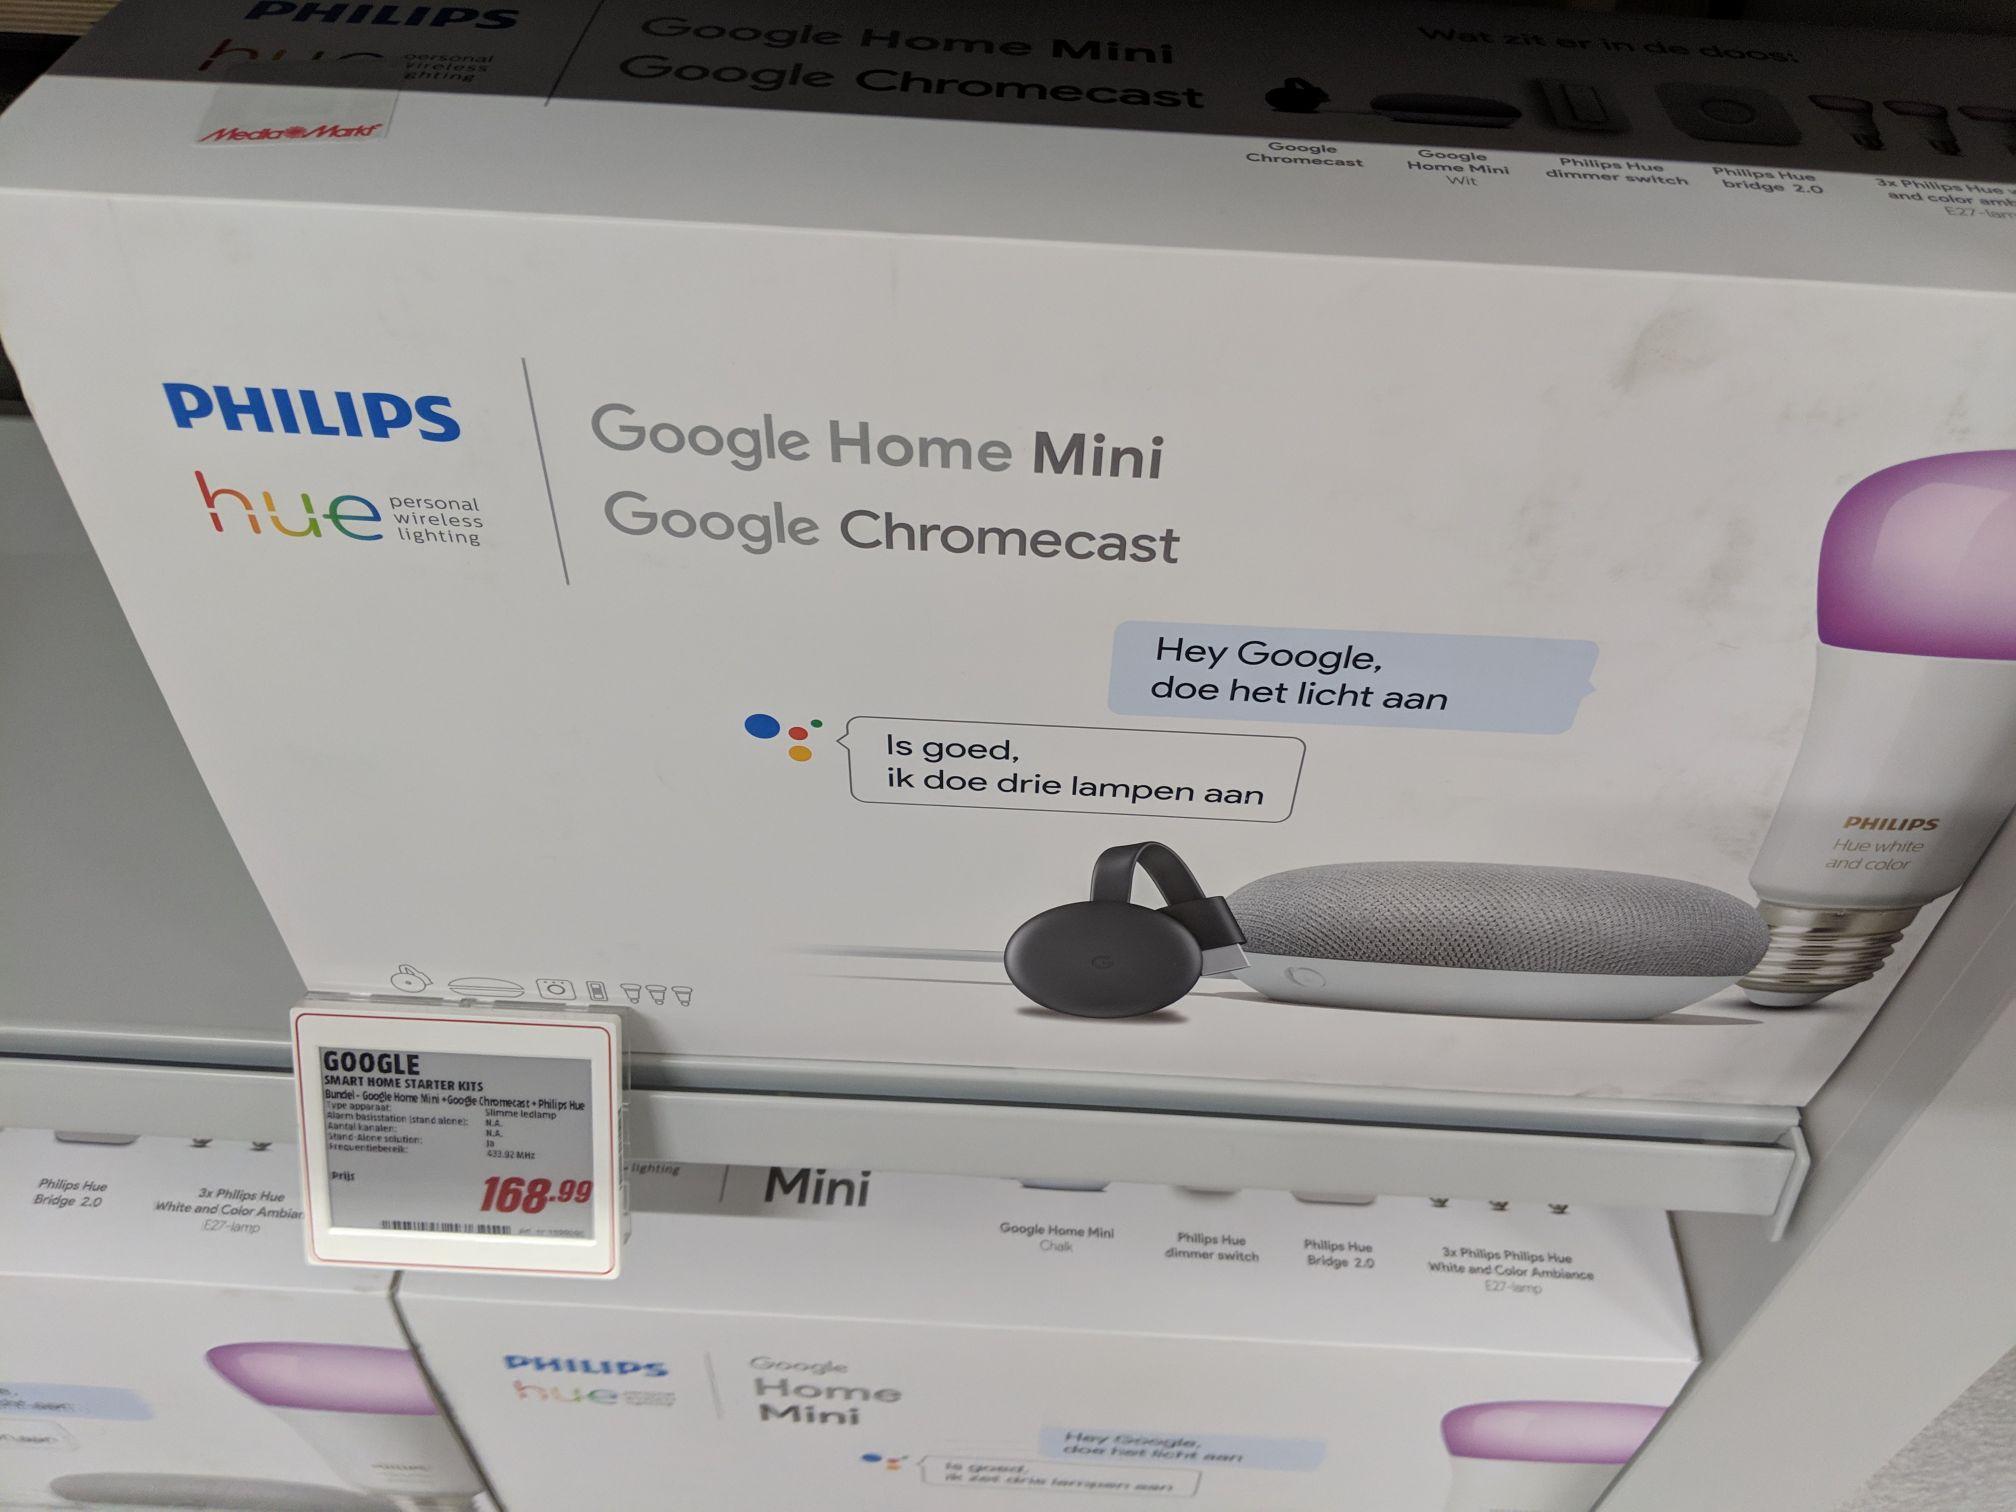 Hue starterskit + Google Home Mini + Chromecast 2018 voor 168,99